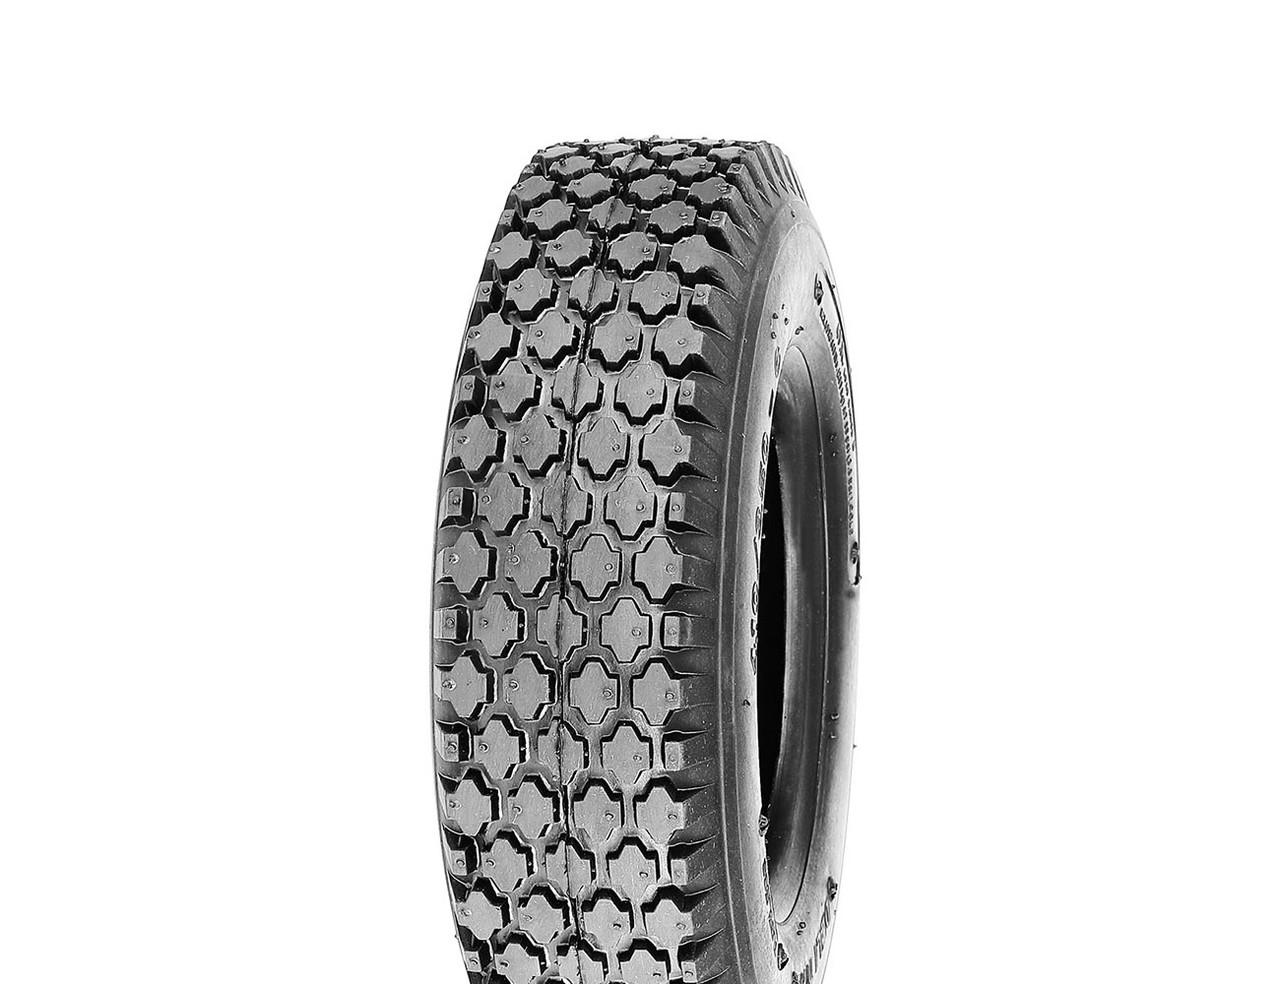 Шина детского квадроцикла Deli Tire S-356 5.30x4.50-6 TT